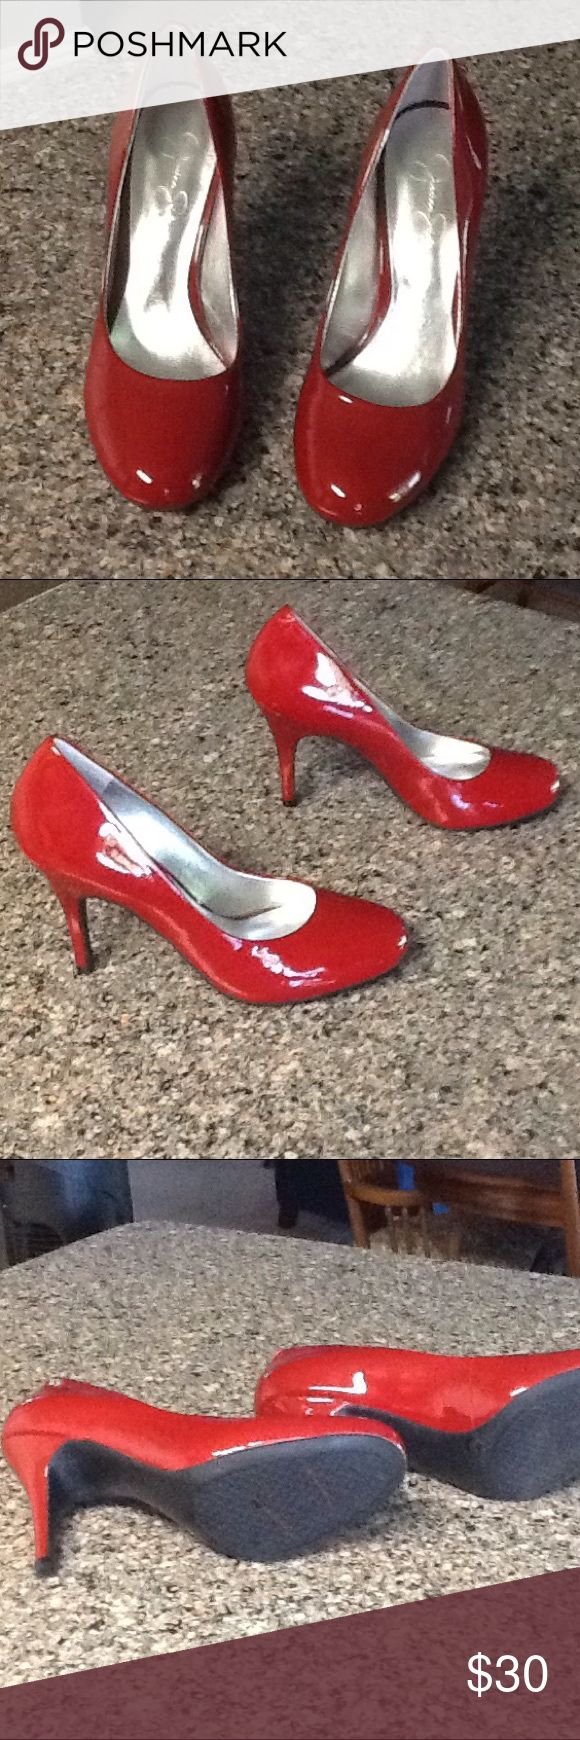 Jessica Simpson Red High Heels December 2017